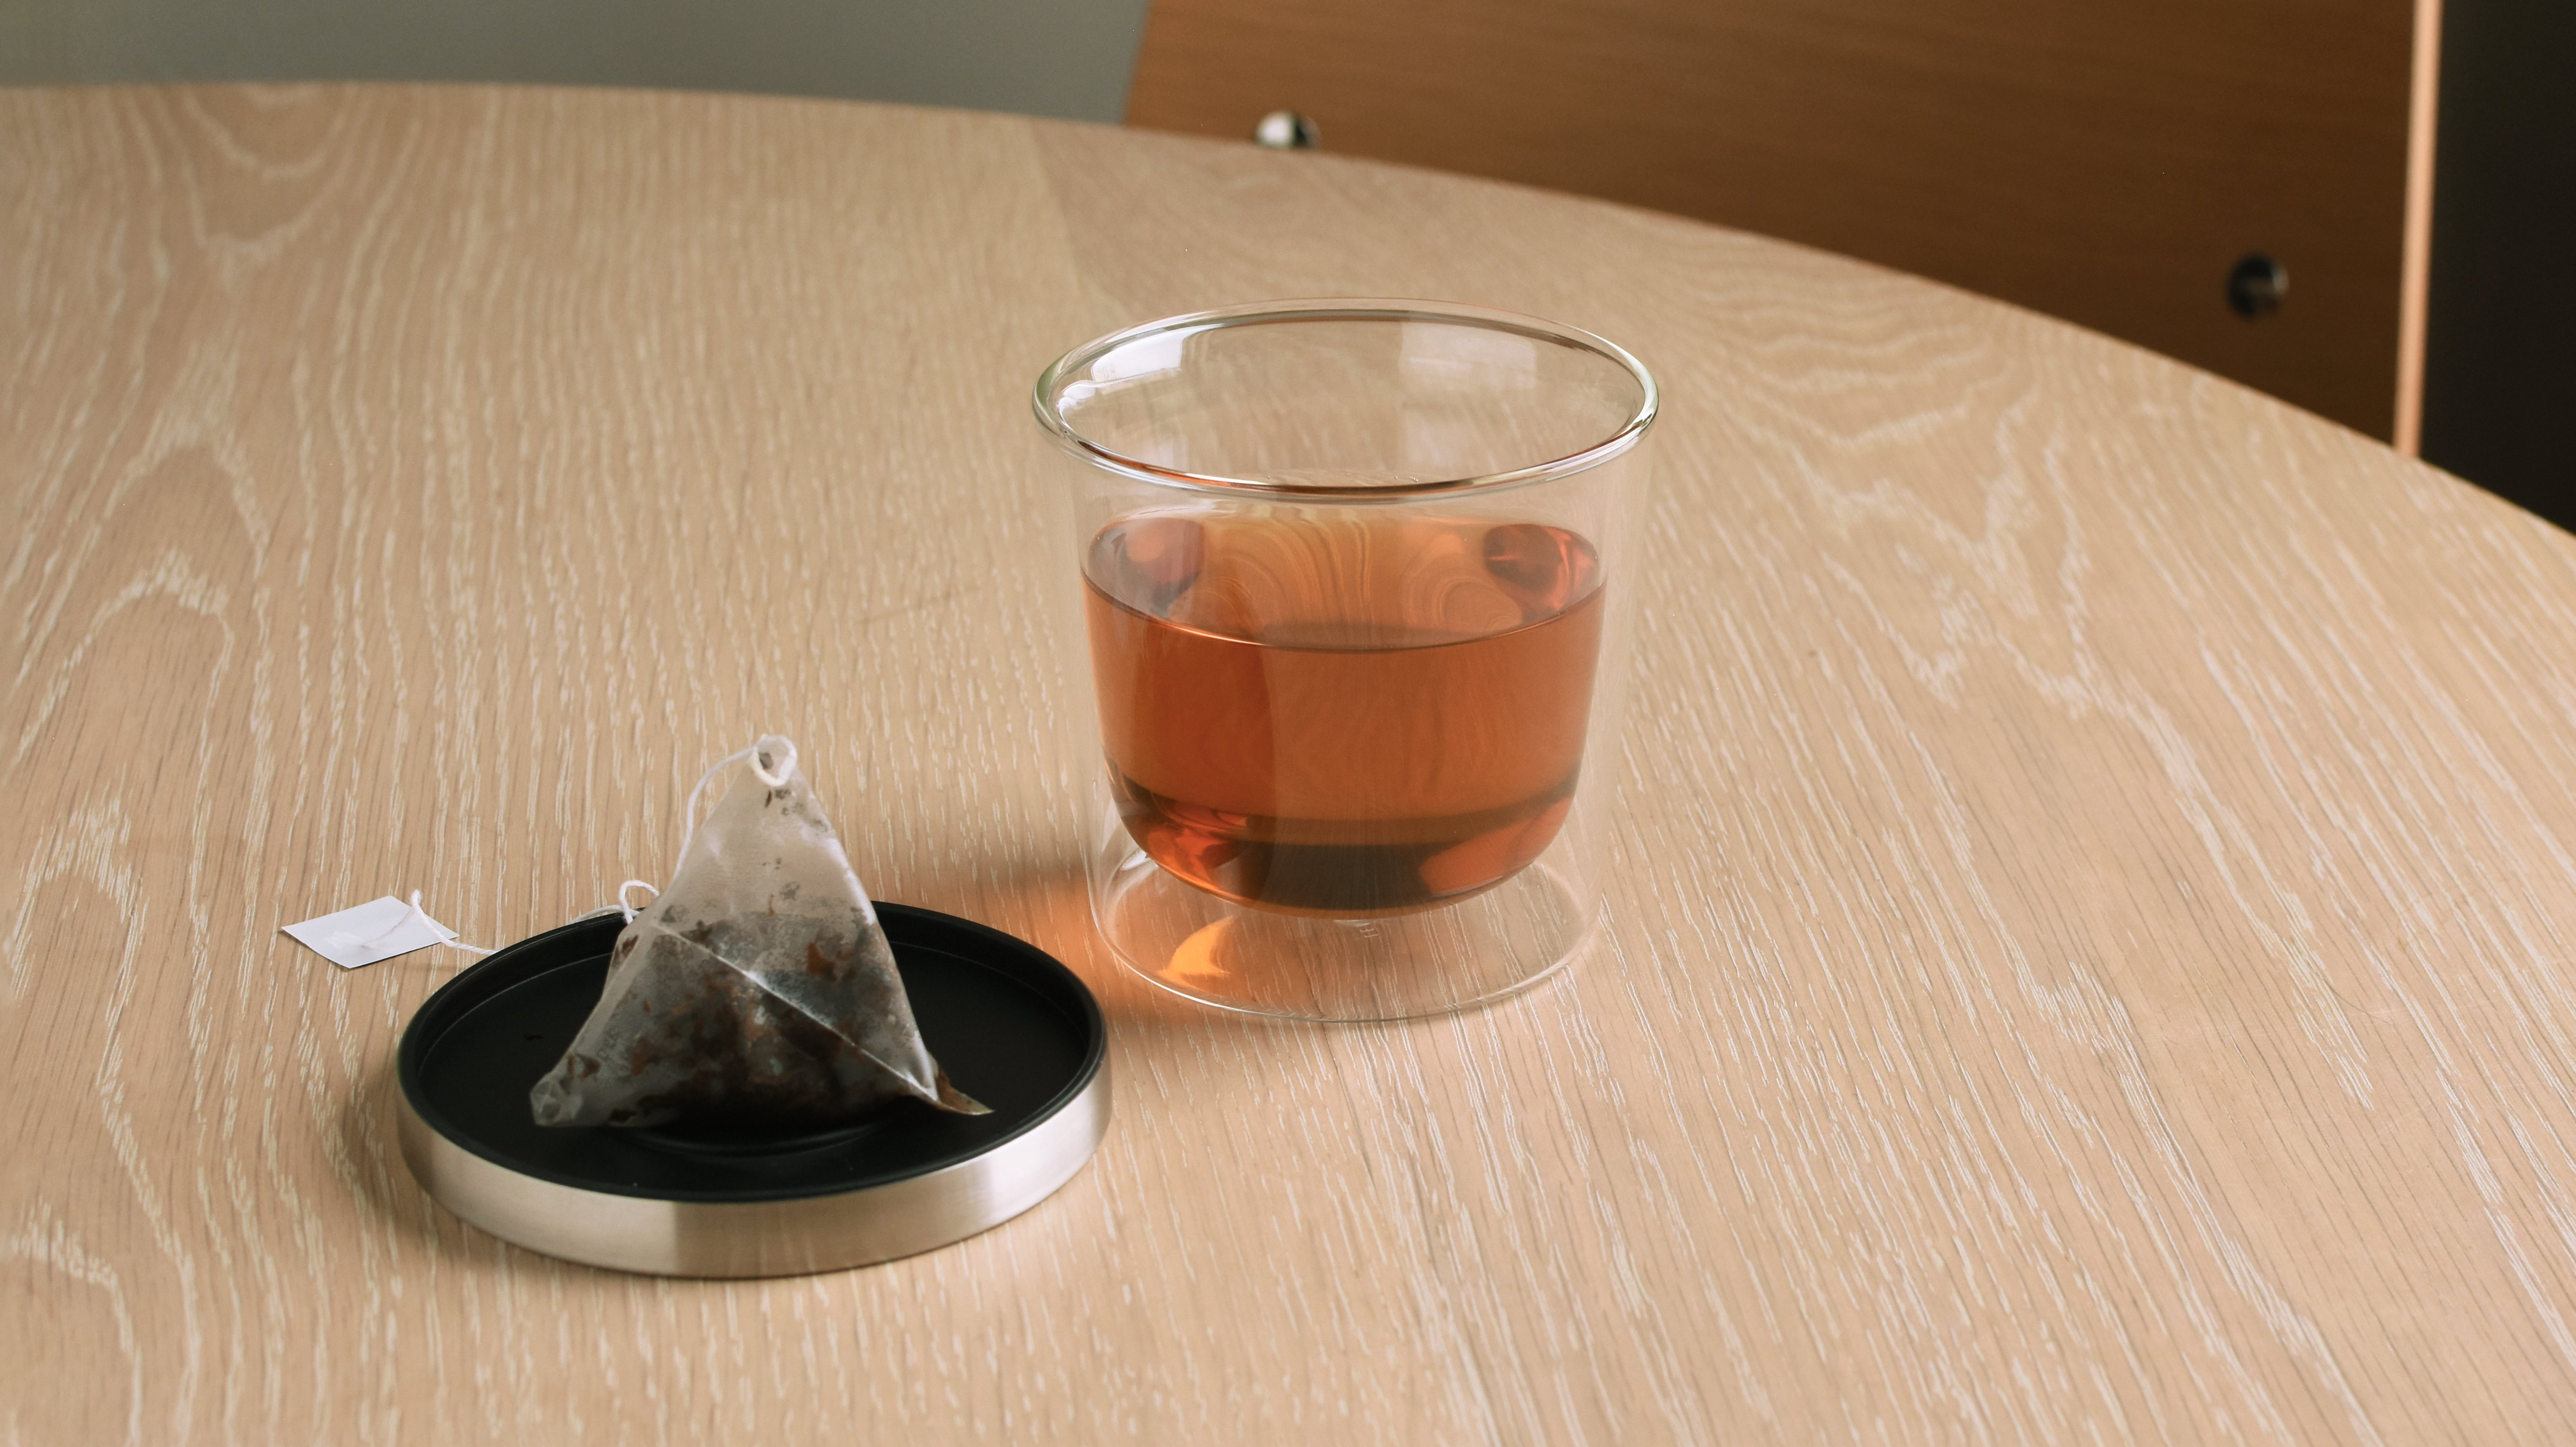 KINTO LT TEA BAG CUP 260ML WHITE-NO-COLOR THUMBNAIL 1